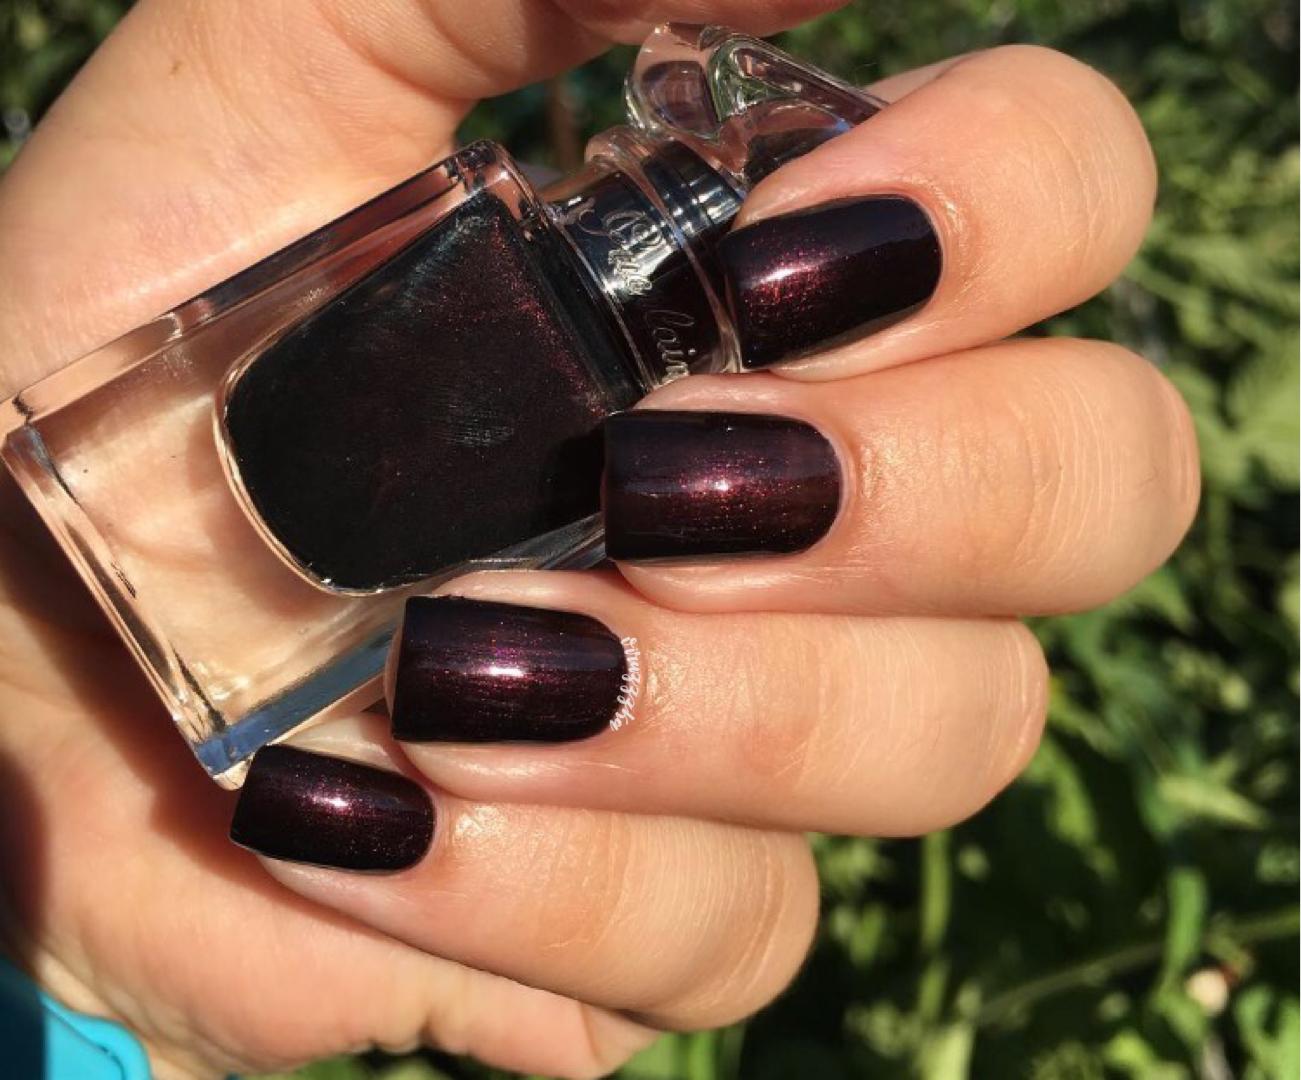 Guerlain Black Perfecto Nail Swatch Autumn Burgundy Black Manicure Review